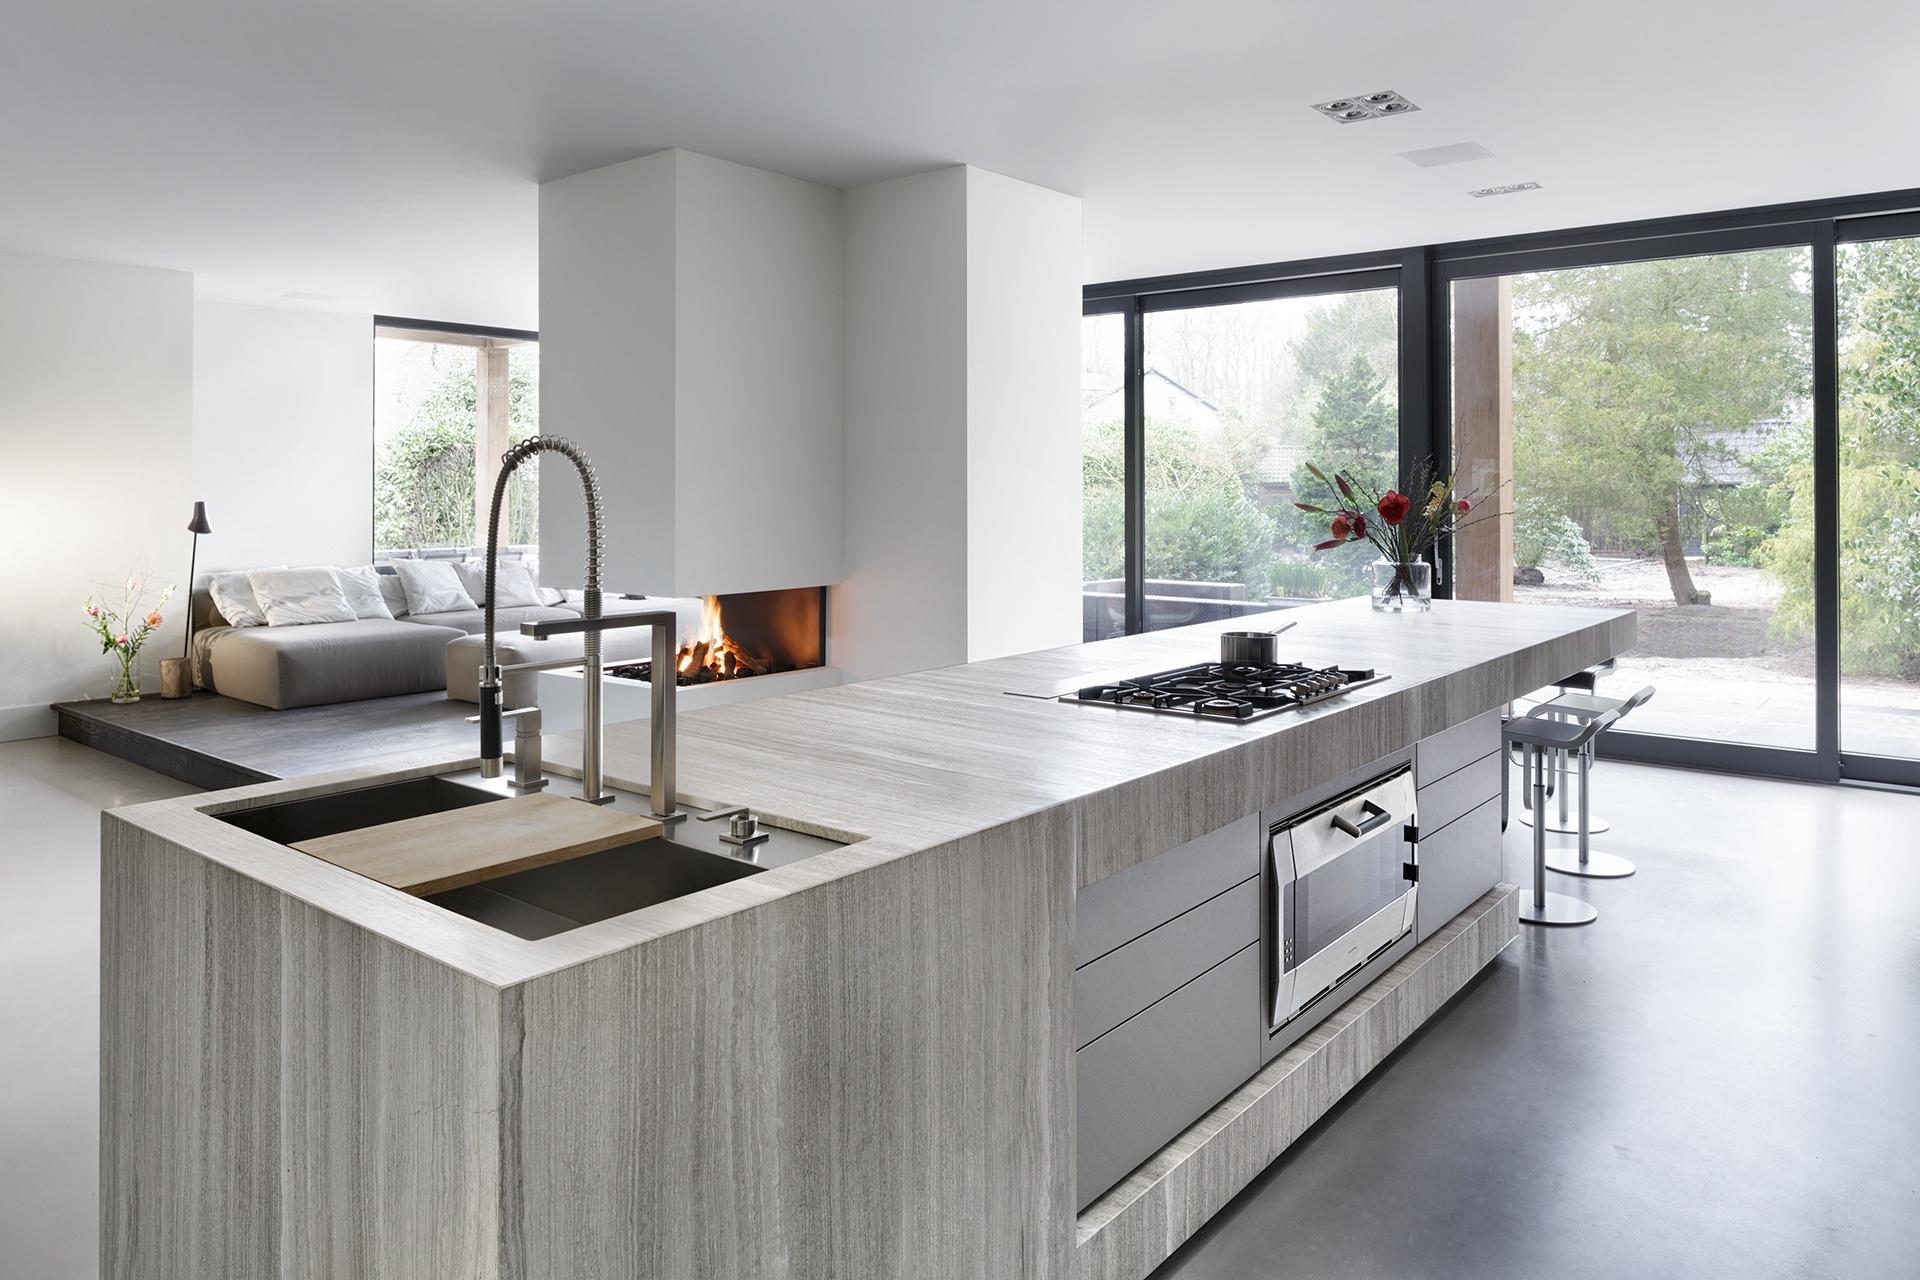 Design Keuken Breda : Design keuken breda moderne huizen